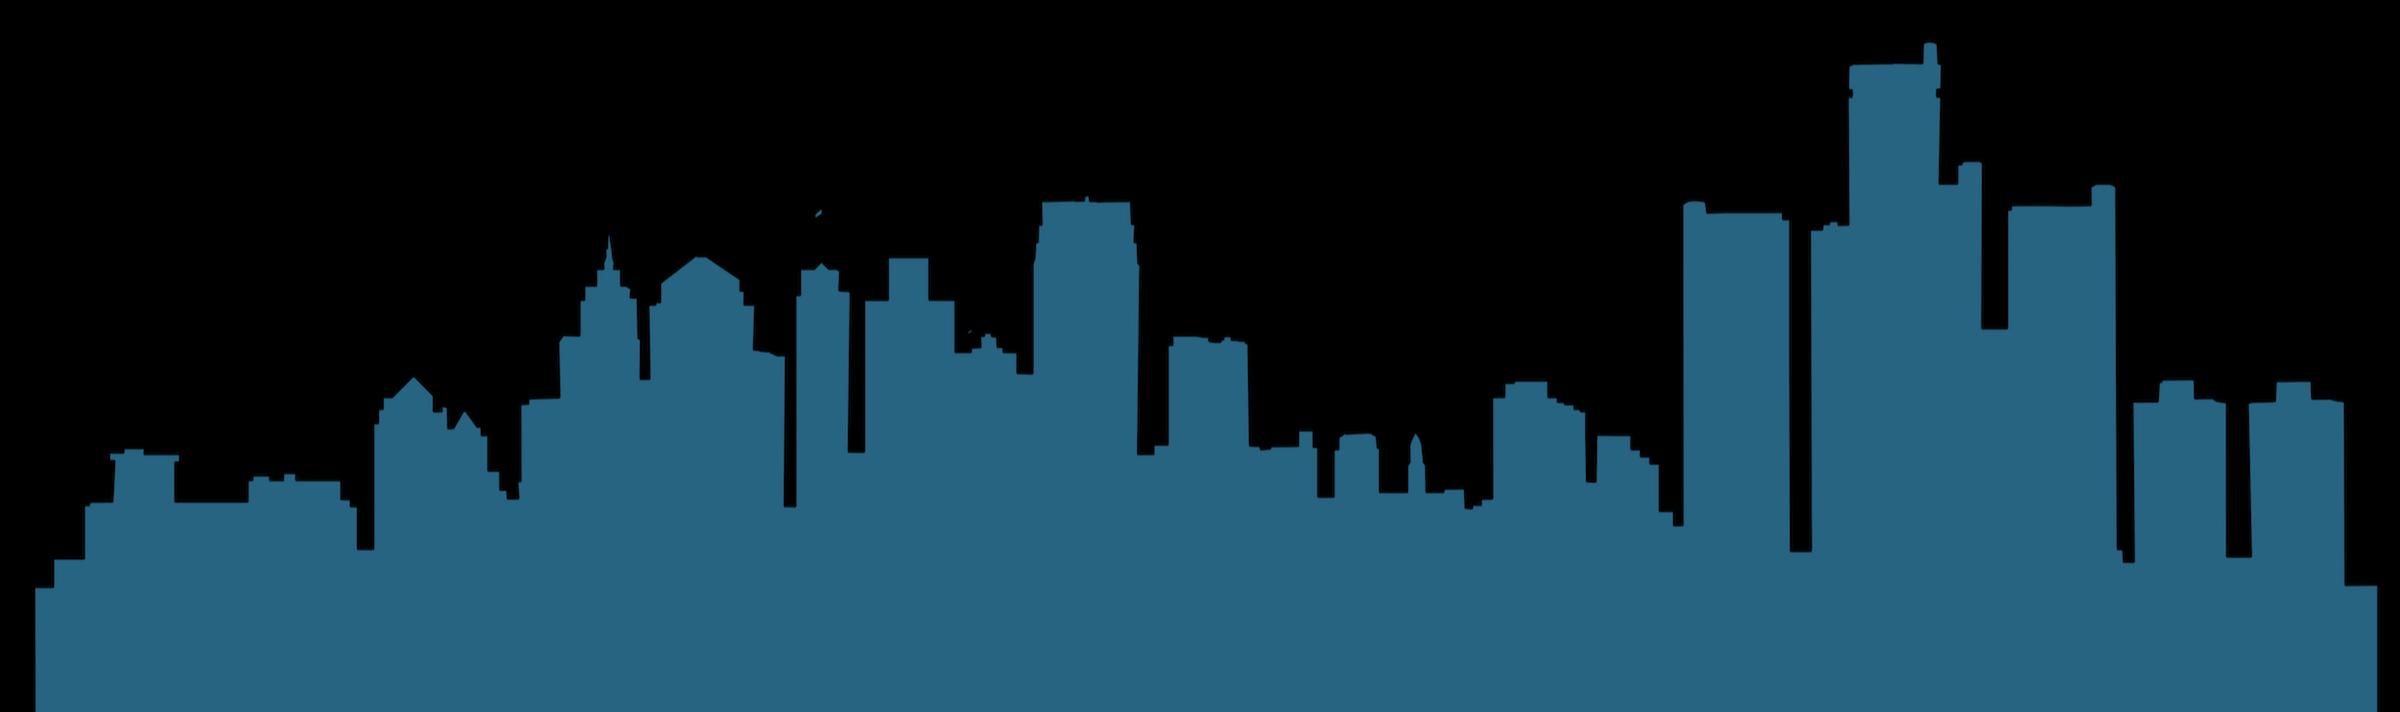 Detroit Vector graphics Skyline Silhouette Illustration.